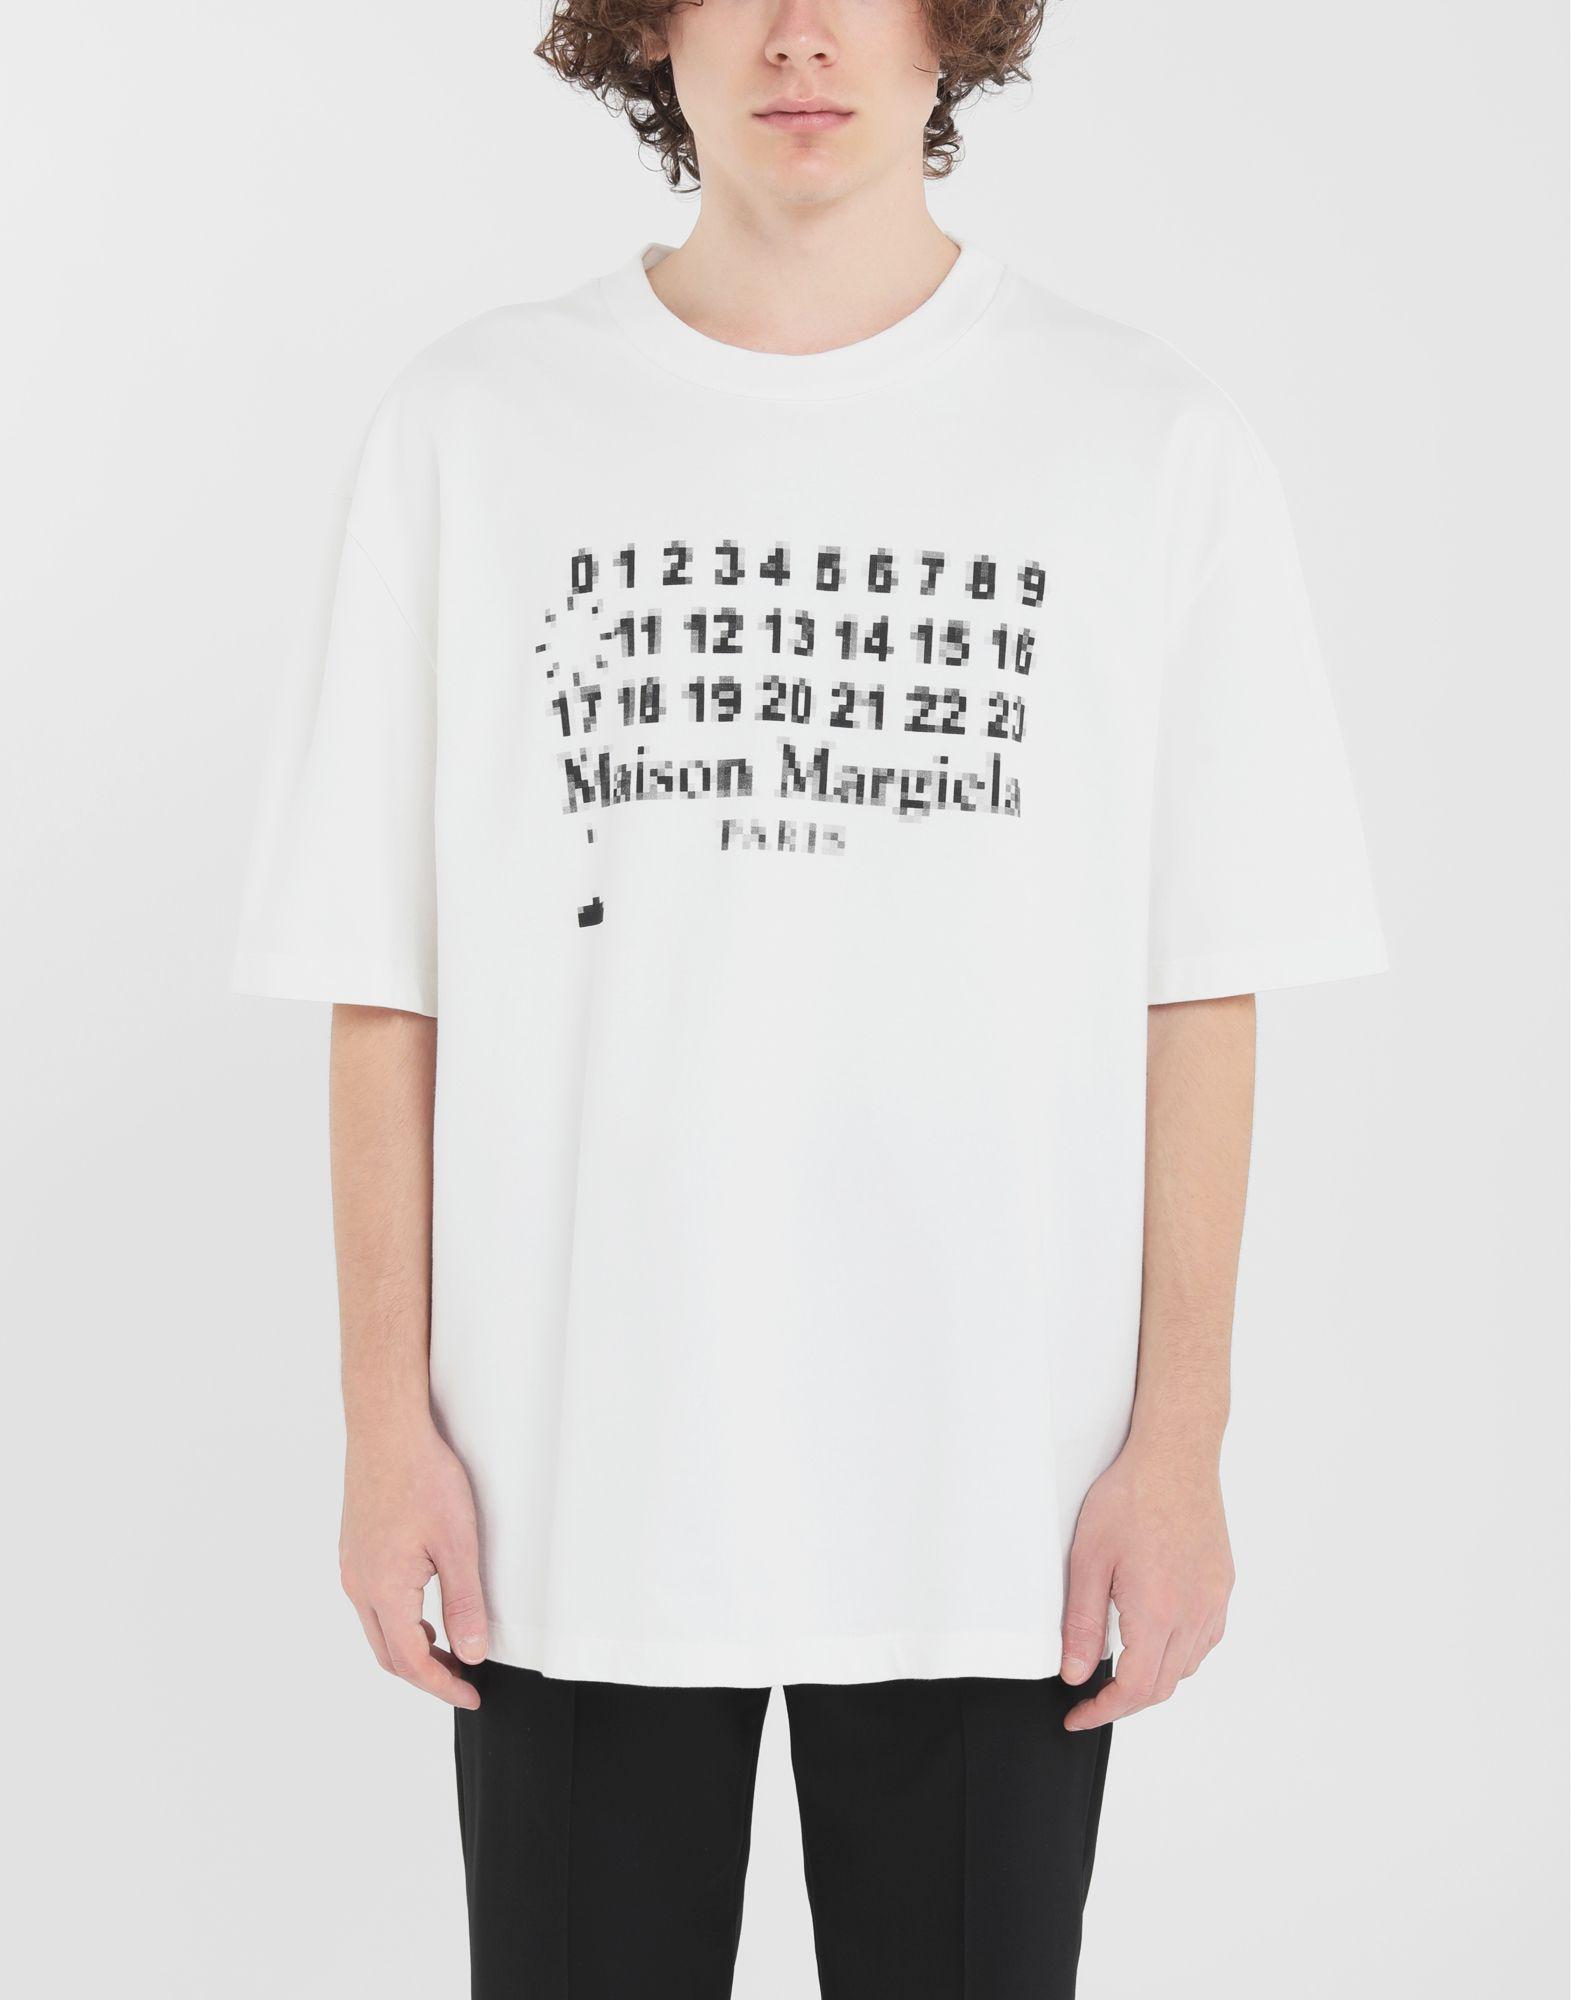 MAISON MARGIELA T-Shirt mit Logo Kurzärmliges T-Shirt Herren r